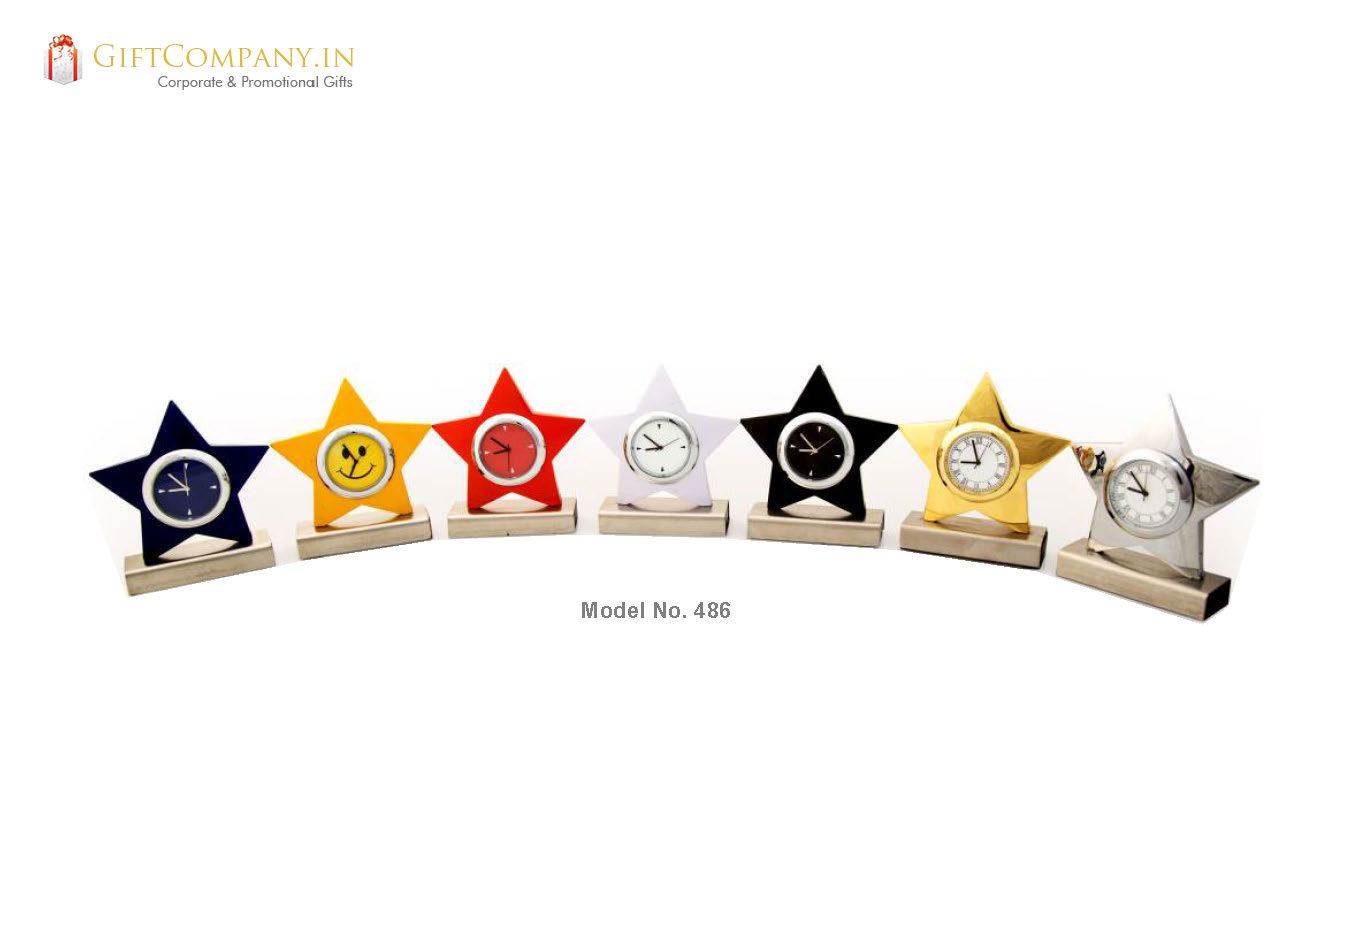 Star Desktop Clock - Model 487